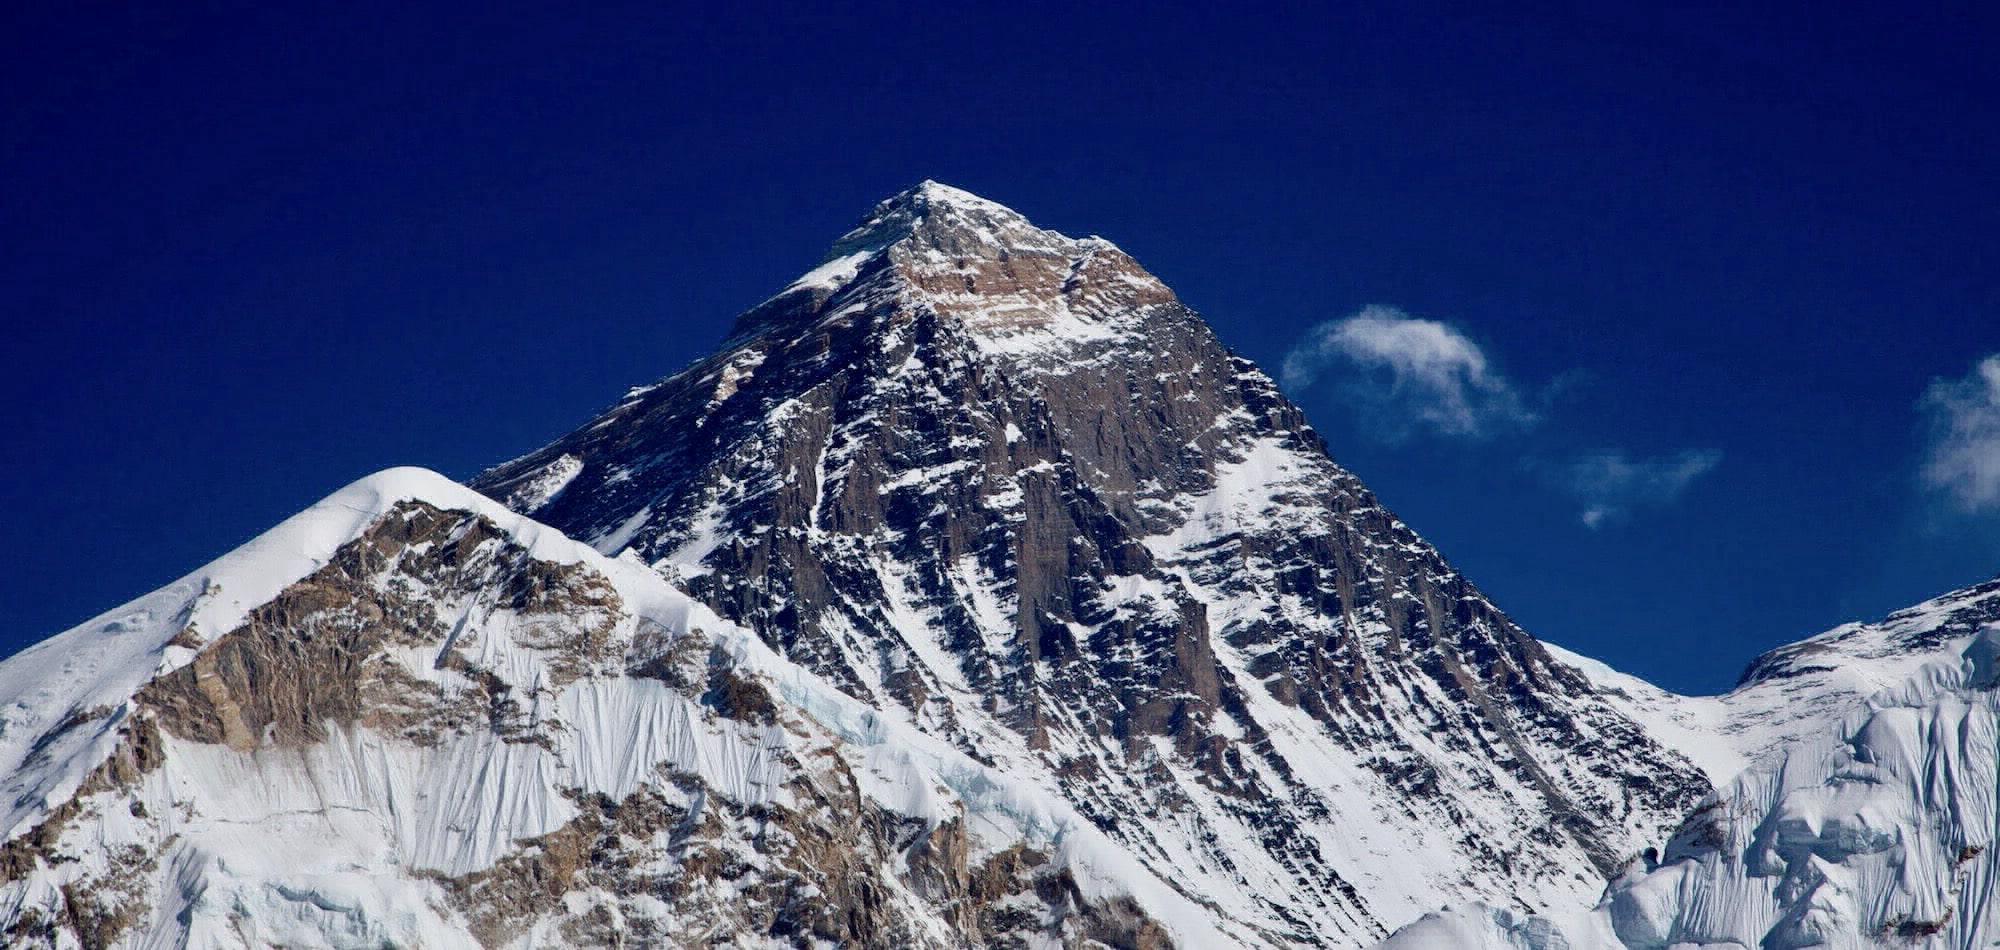 Everest Base Camp Trail